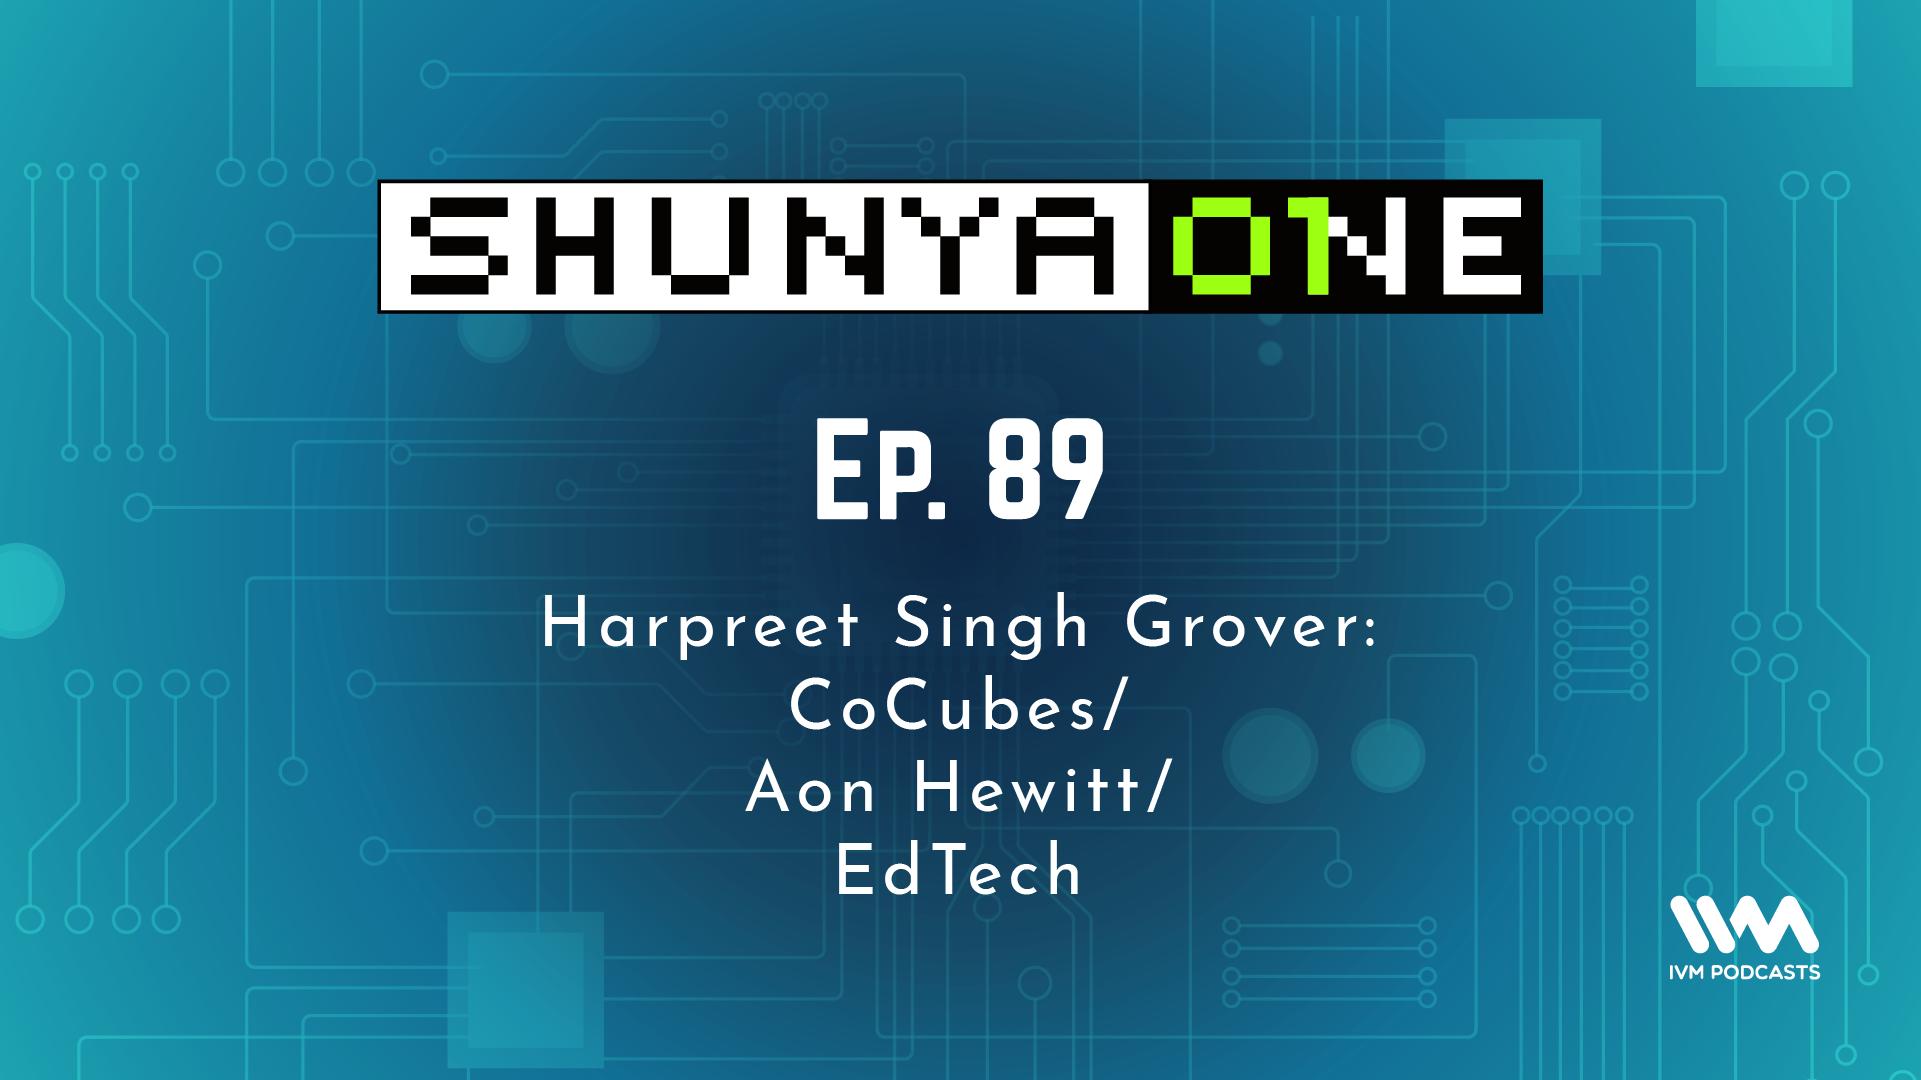 ShunyaOneEpisode89.png